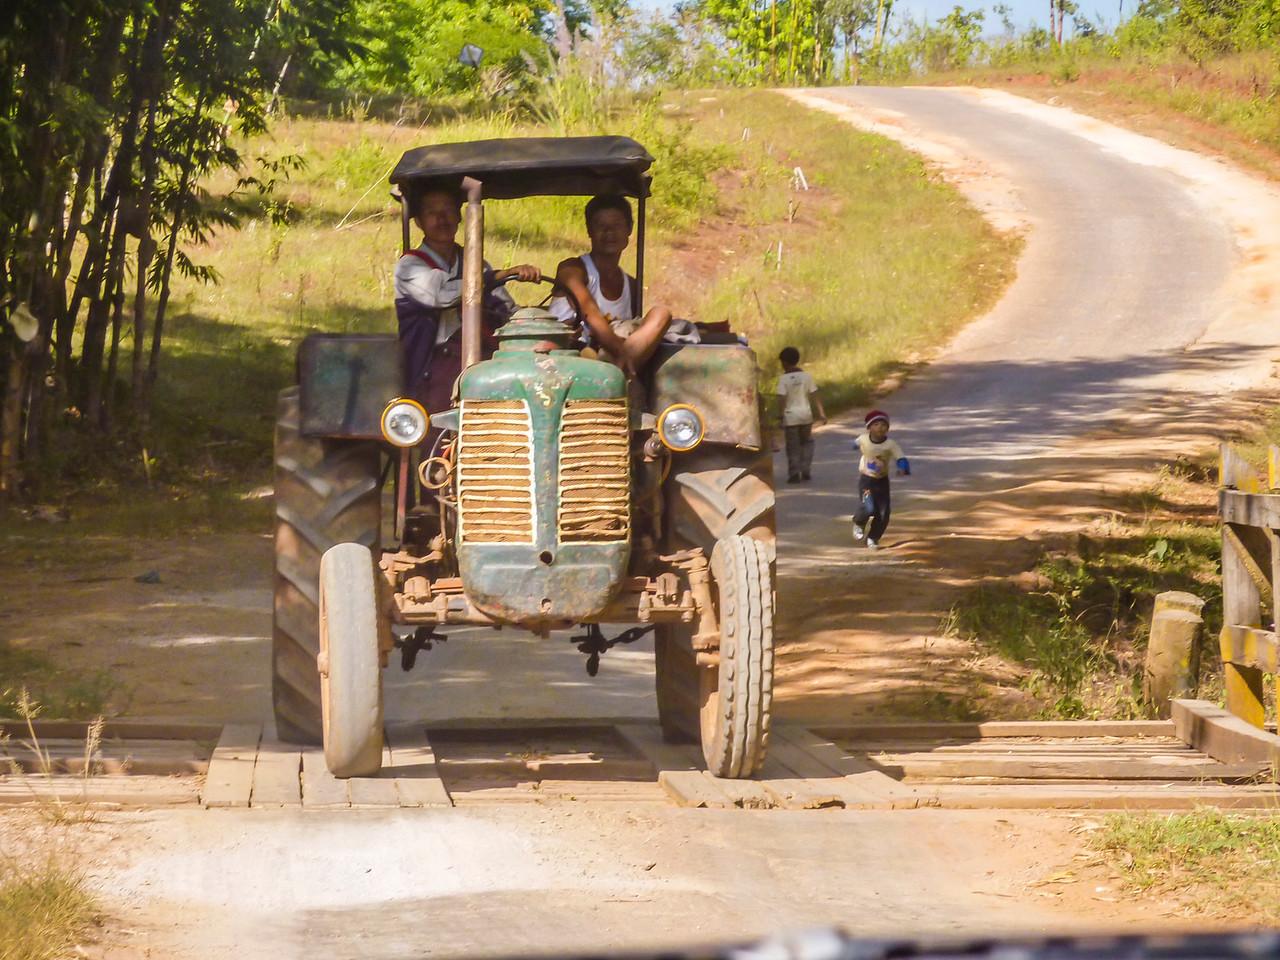 On the road in Myanmar 2009